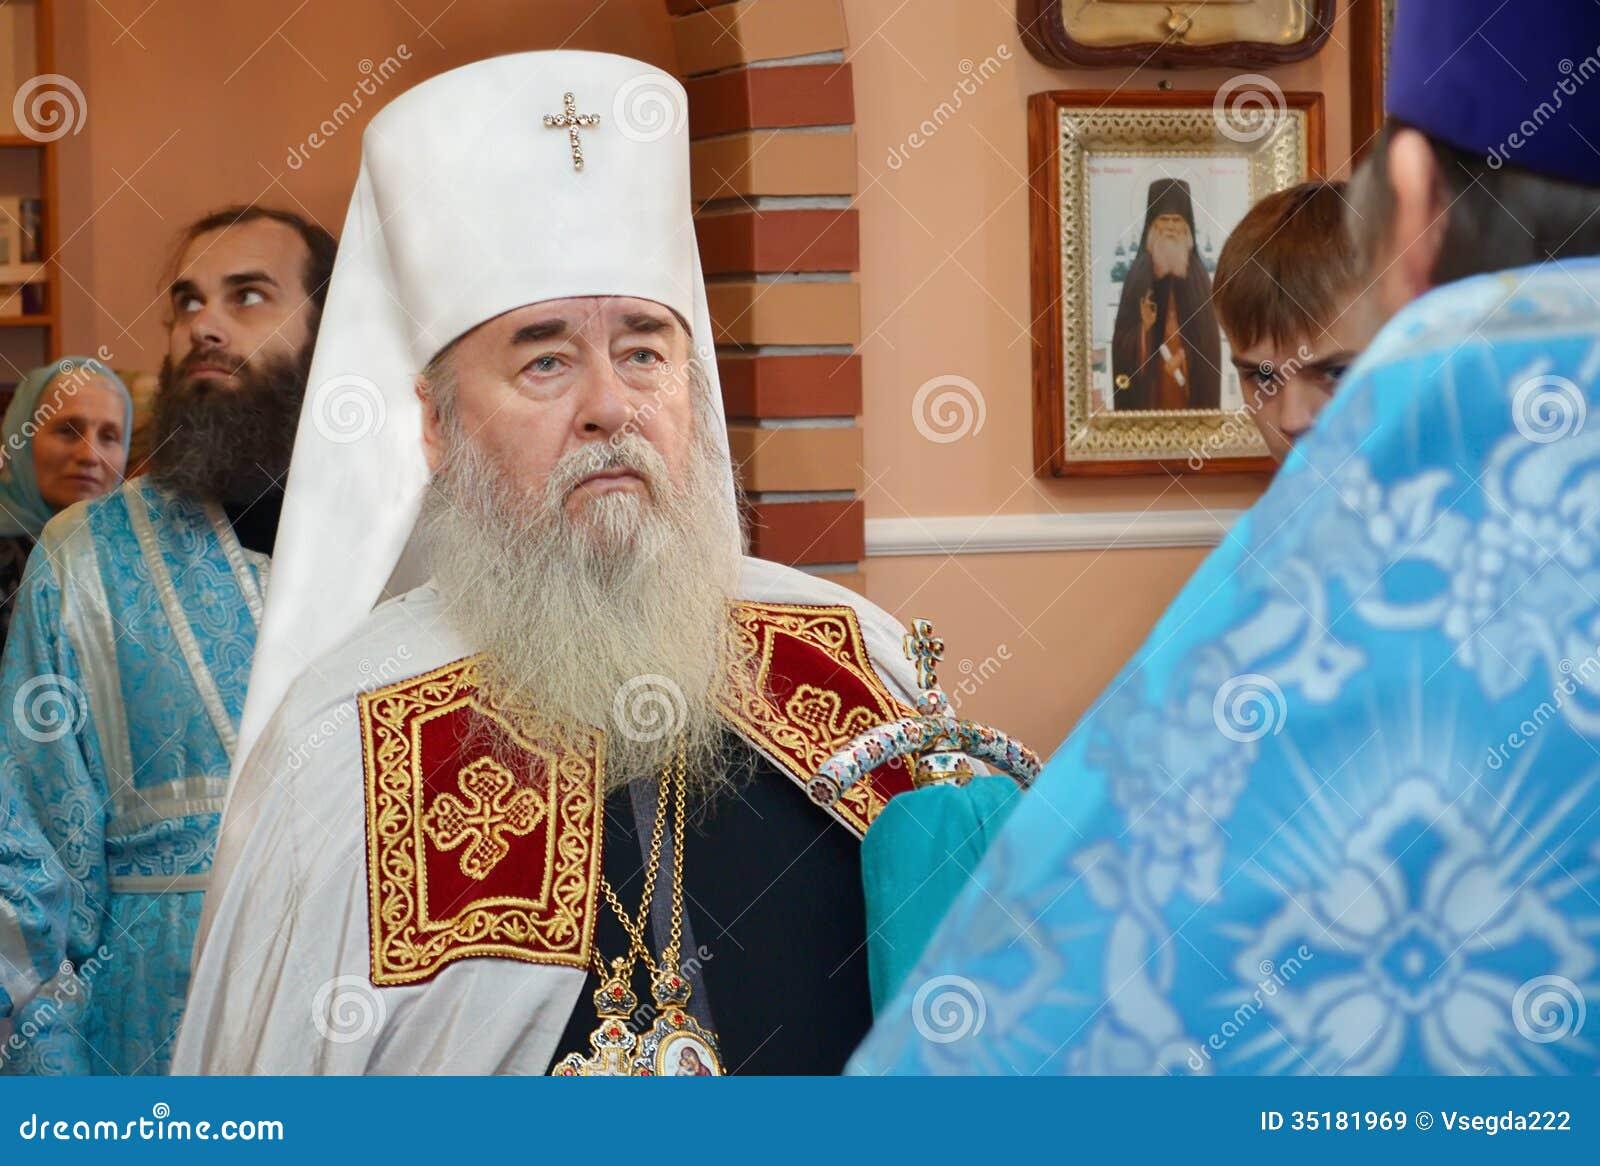 Why I Am Not Orthodox